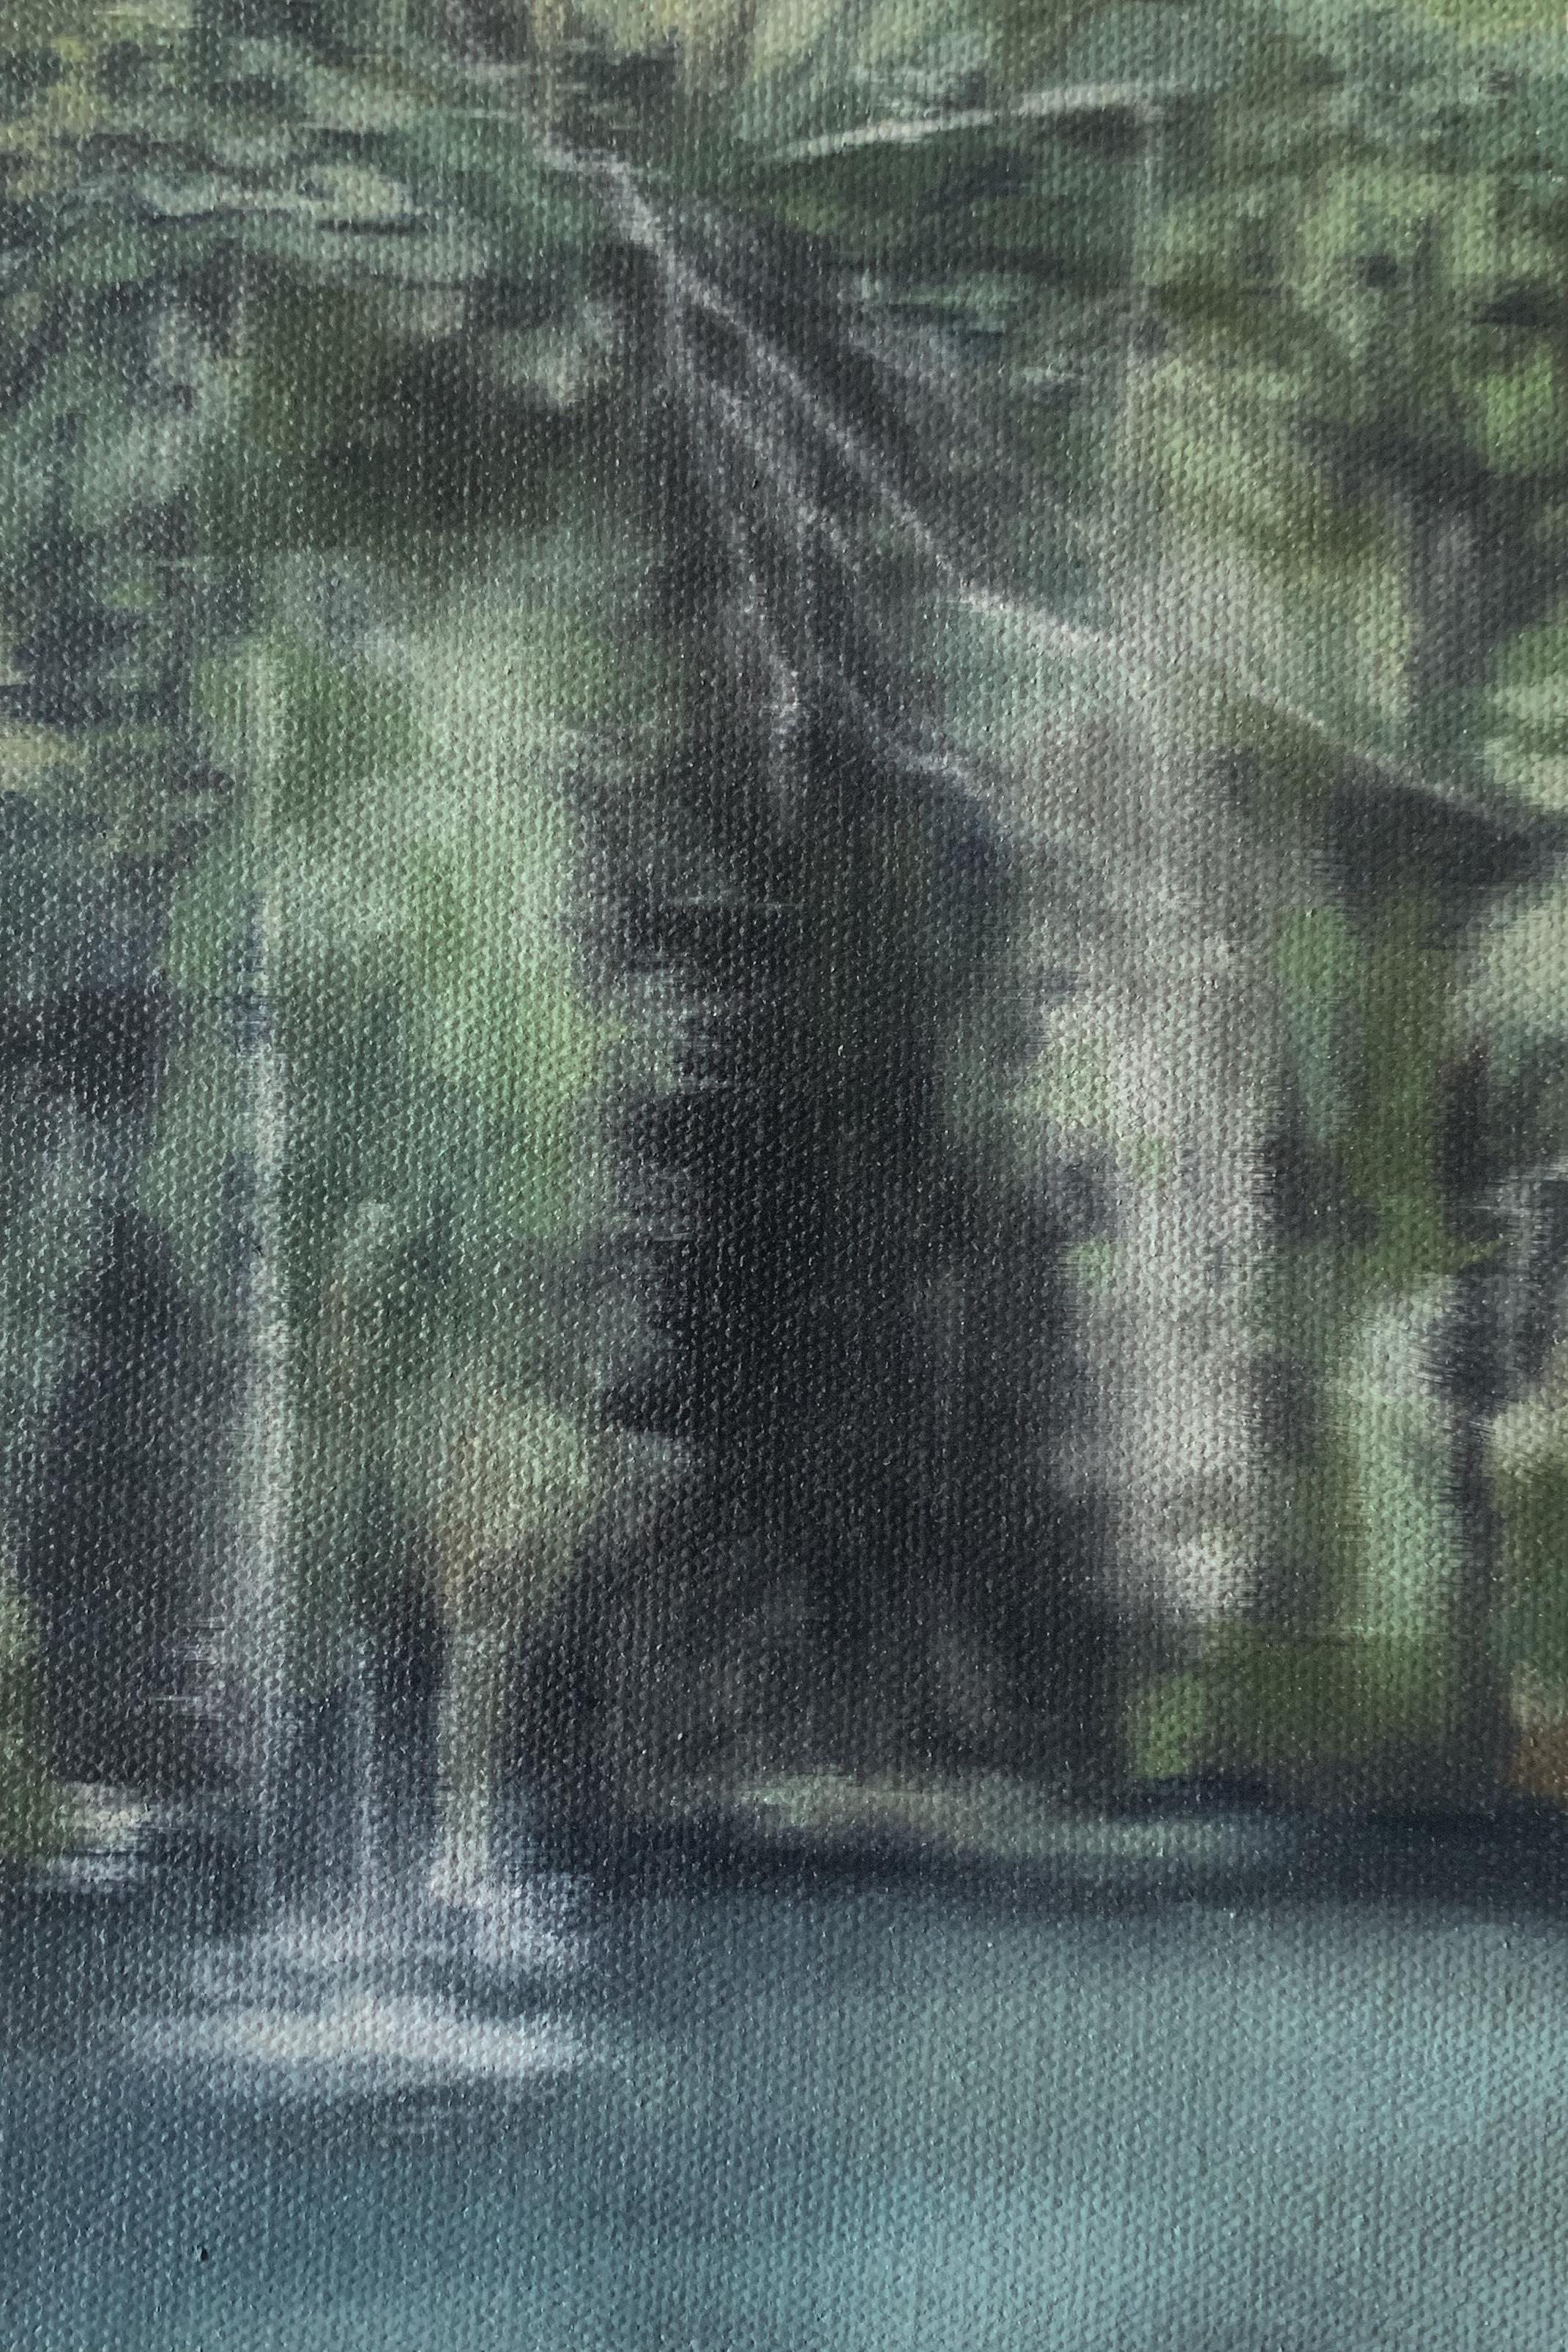 AMELIA CARROLL  image.94 , 2019 oil on canvas 18 x 12.5 cm